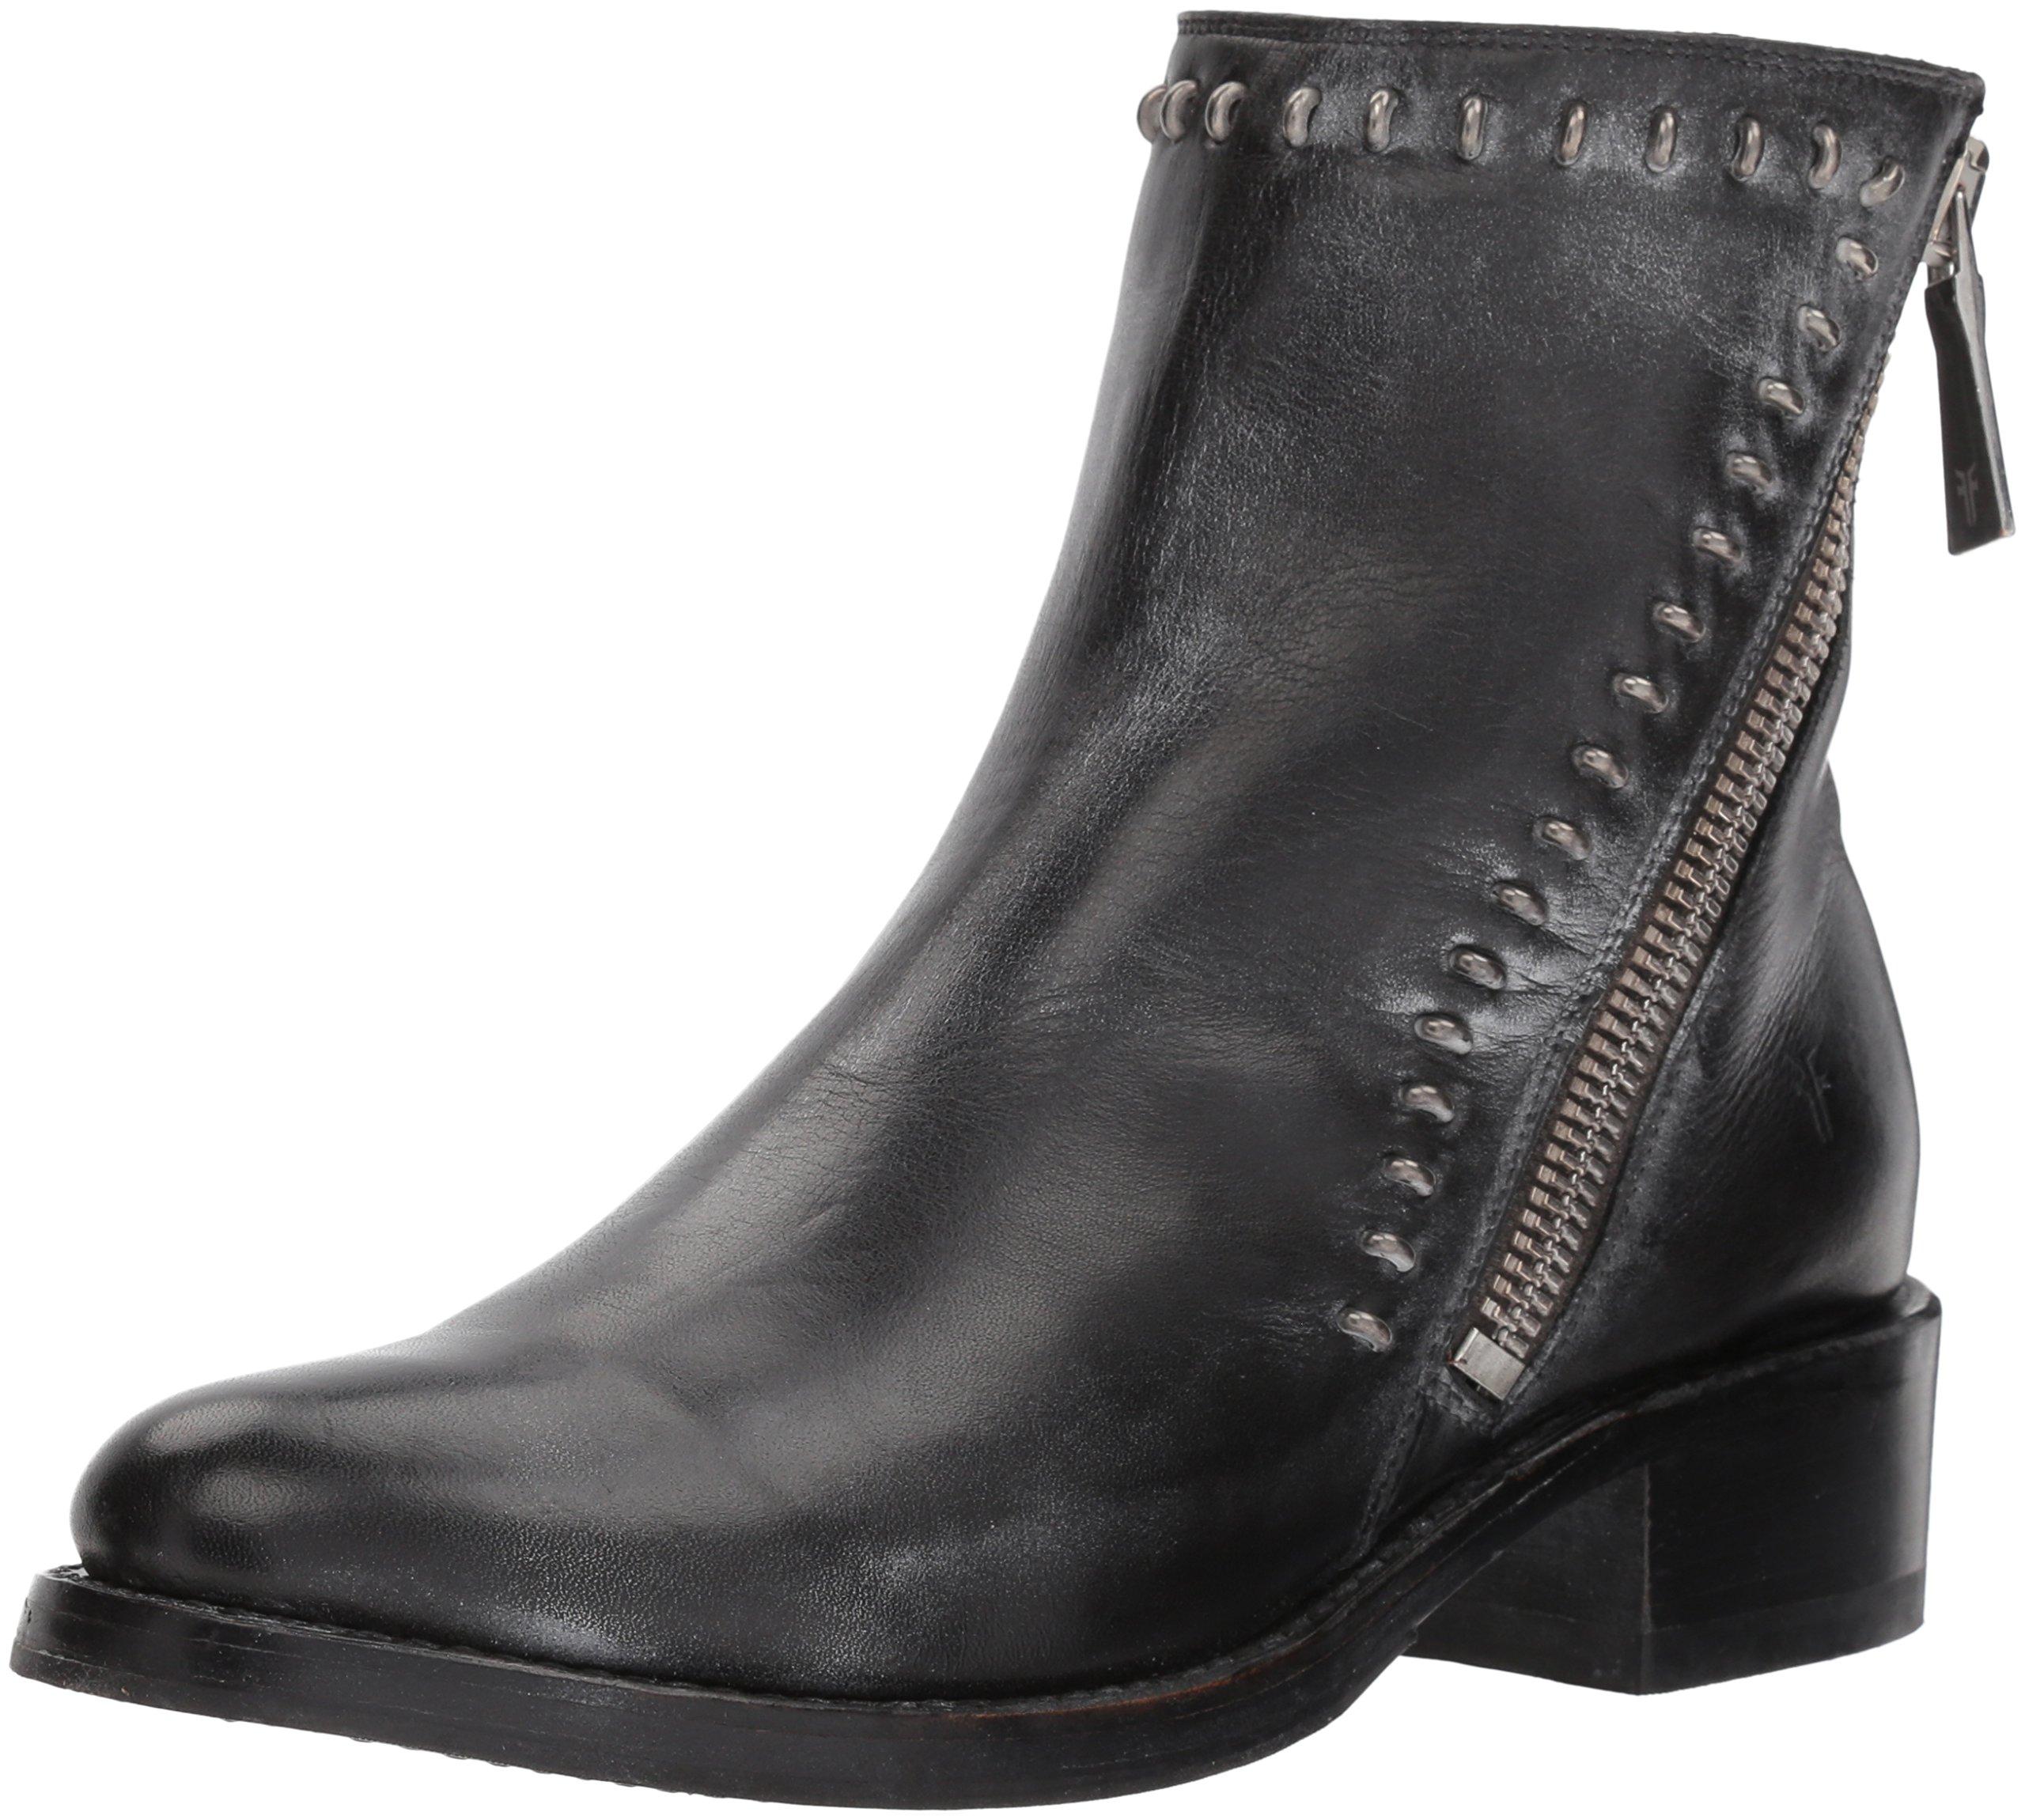 FRYE Women's Demi Rebel Zip Bootie Ankle Boot, Black, 9 M US